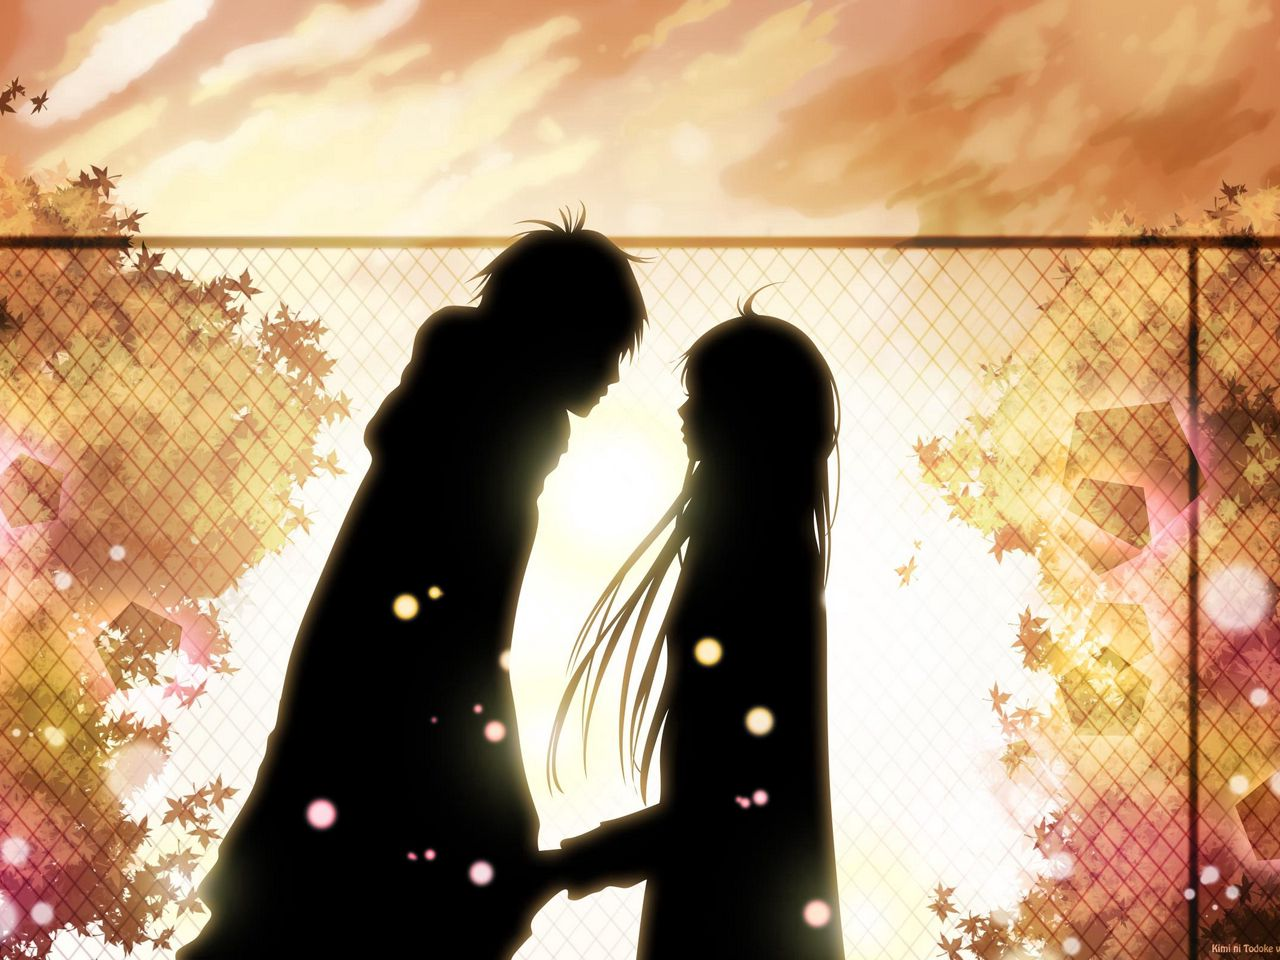 1280x960 Wallpaper kimi ni todoke, girl, boy, love, feelings, meet, date, fall, leaves